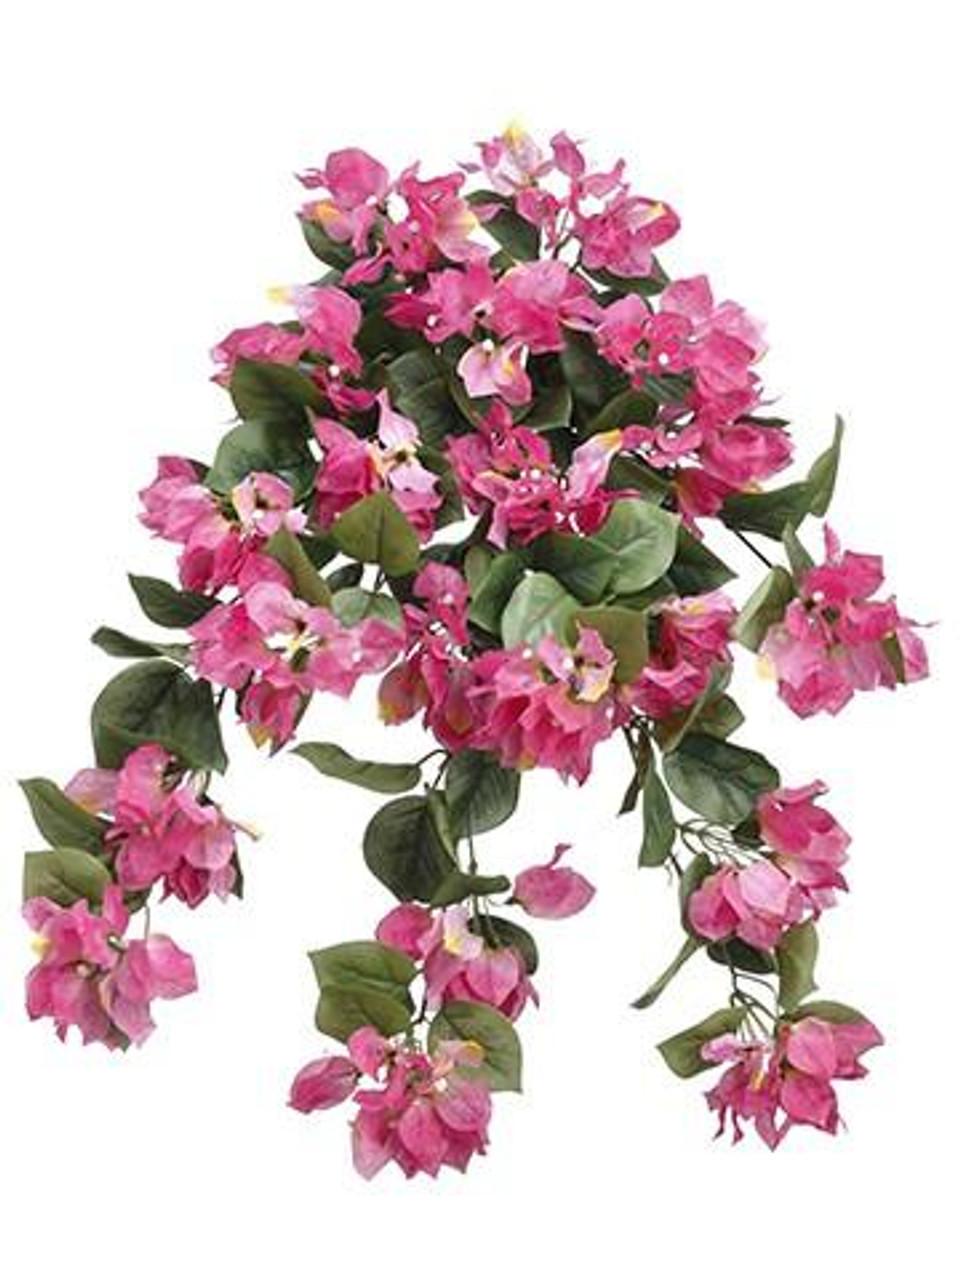 24 Bougainvillea Hanging Bush Mavue Pink 6 Pieces Fbb103 Mv Pk